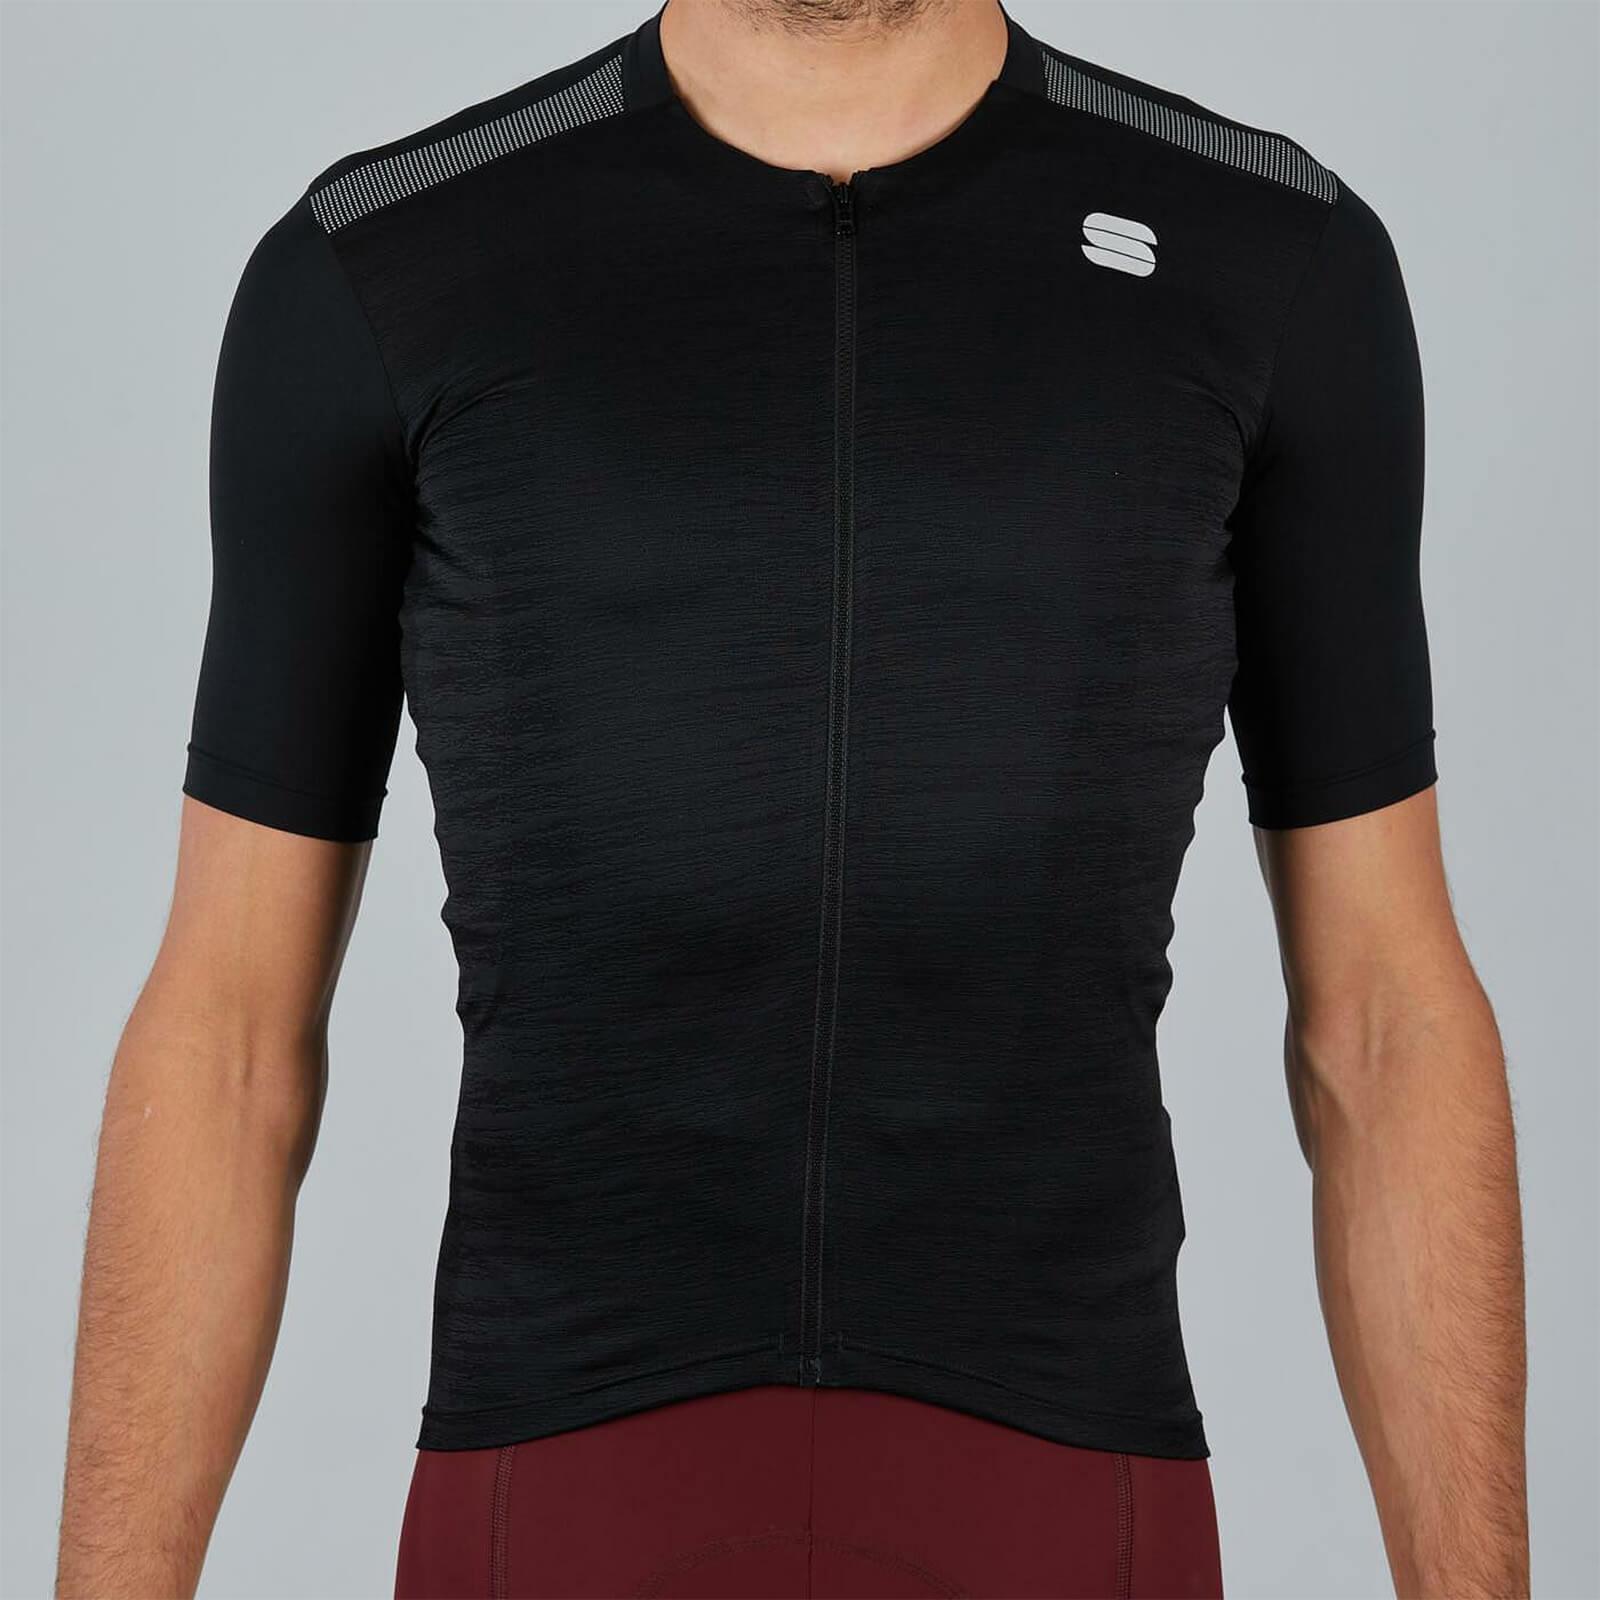 Sportful Supergiara Jersey - S - Black